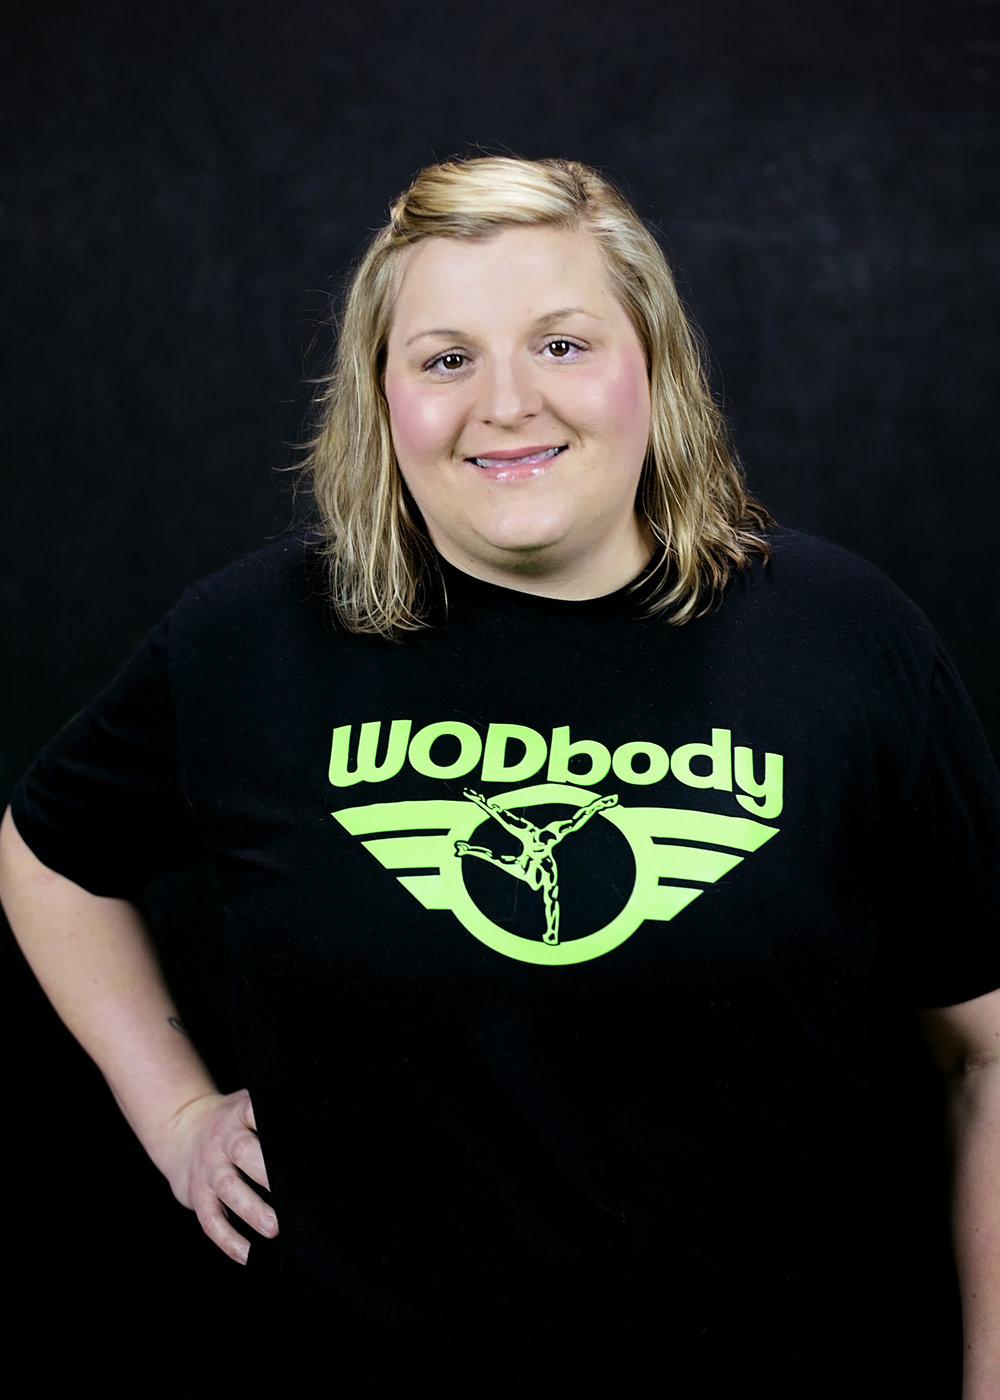 wodbody5.jpg